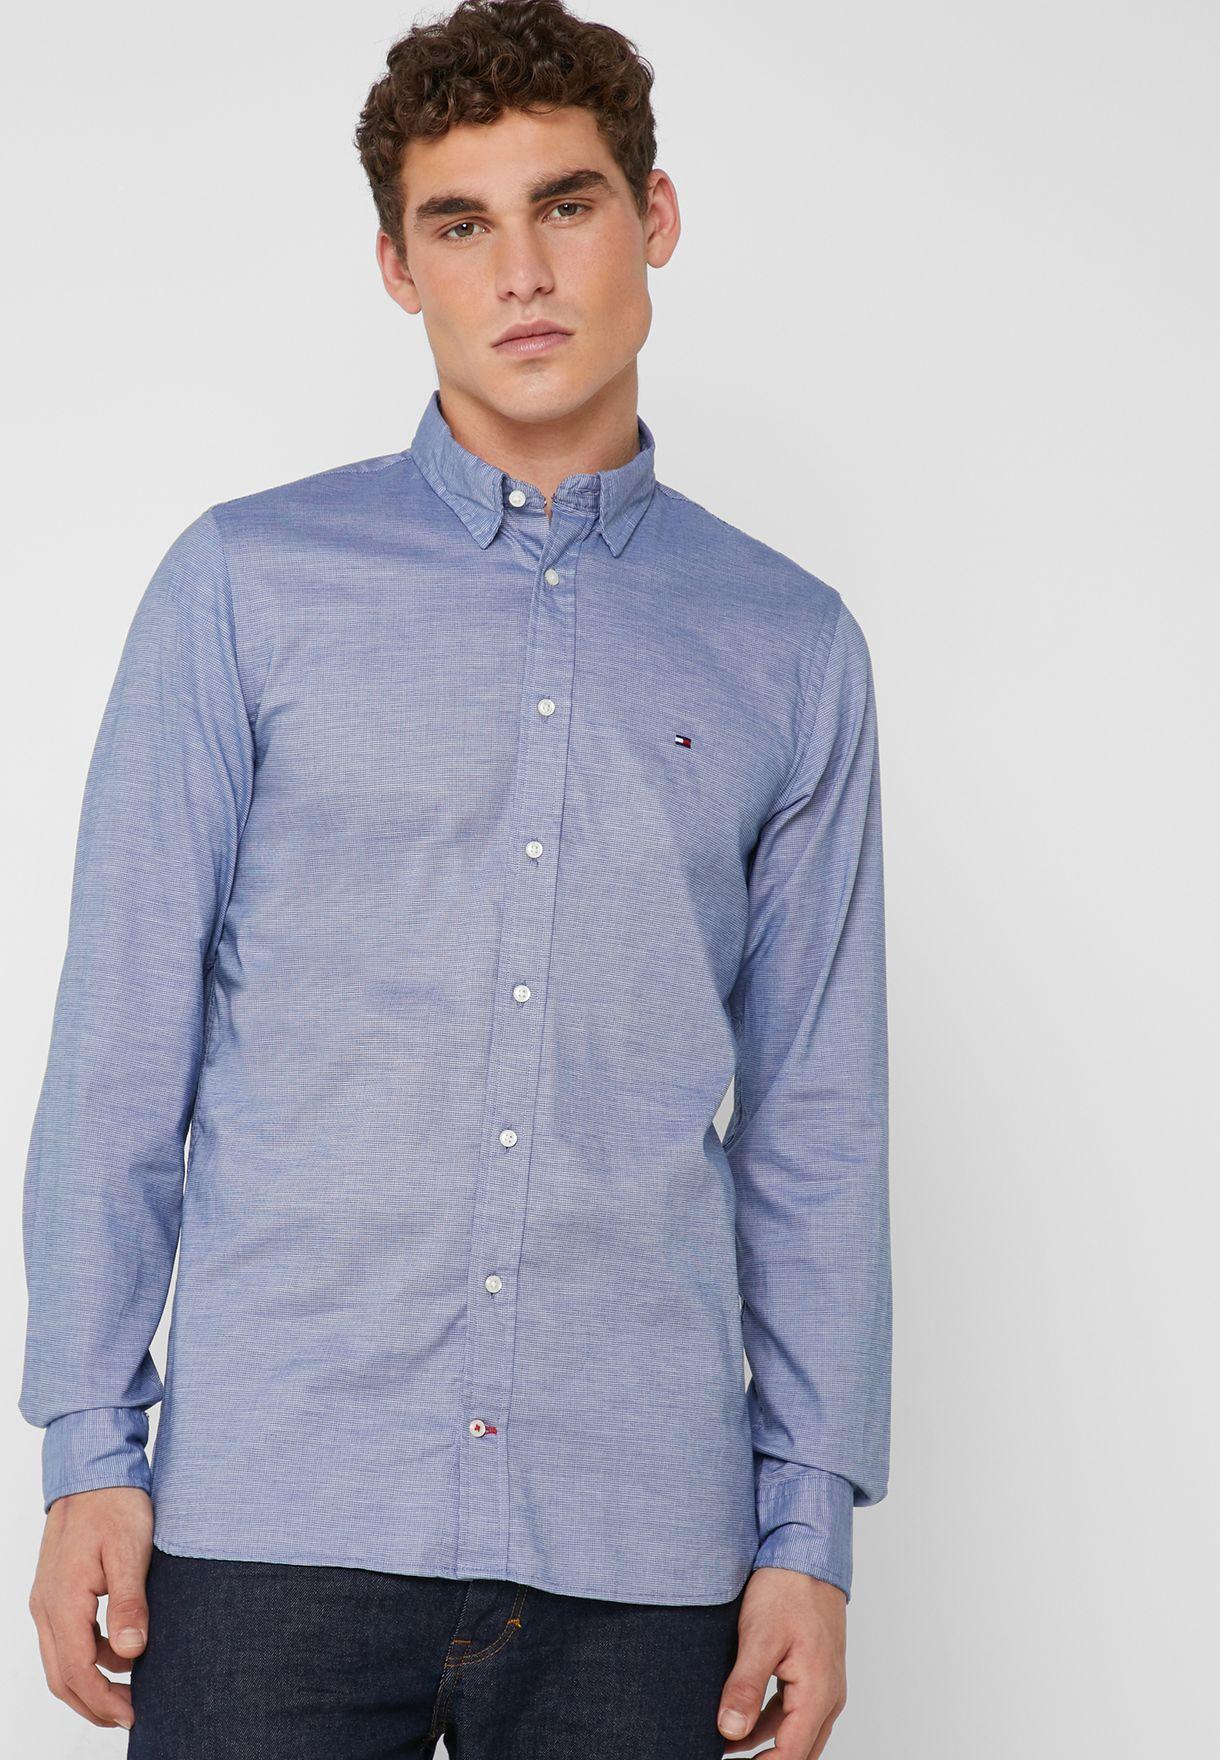 2e25f0bca Shop Tommy Hilfiger blue Essential Dobby Shirt MW0MW09877 for Men in ...